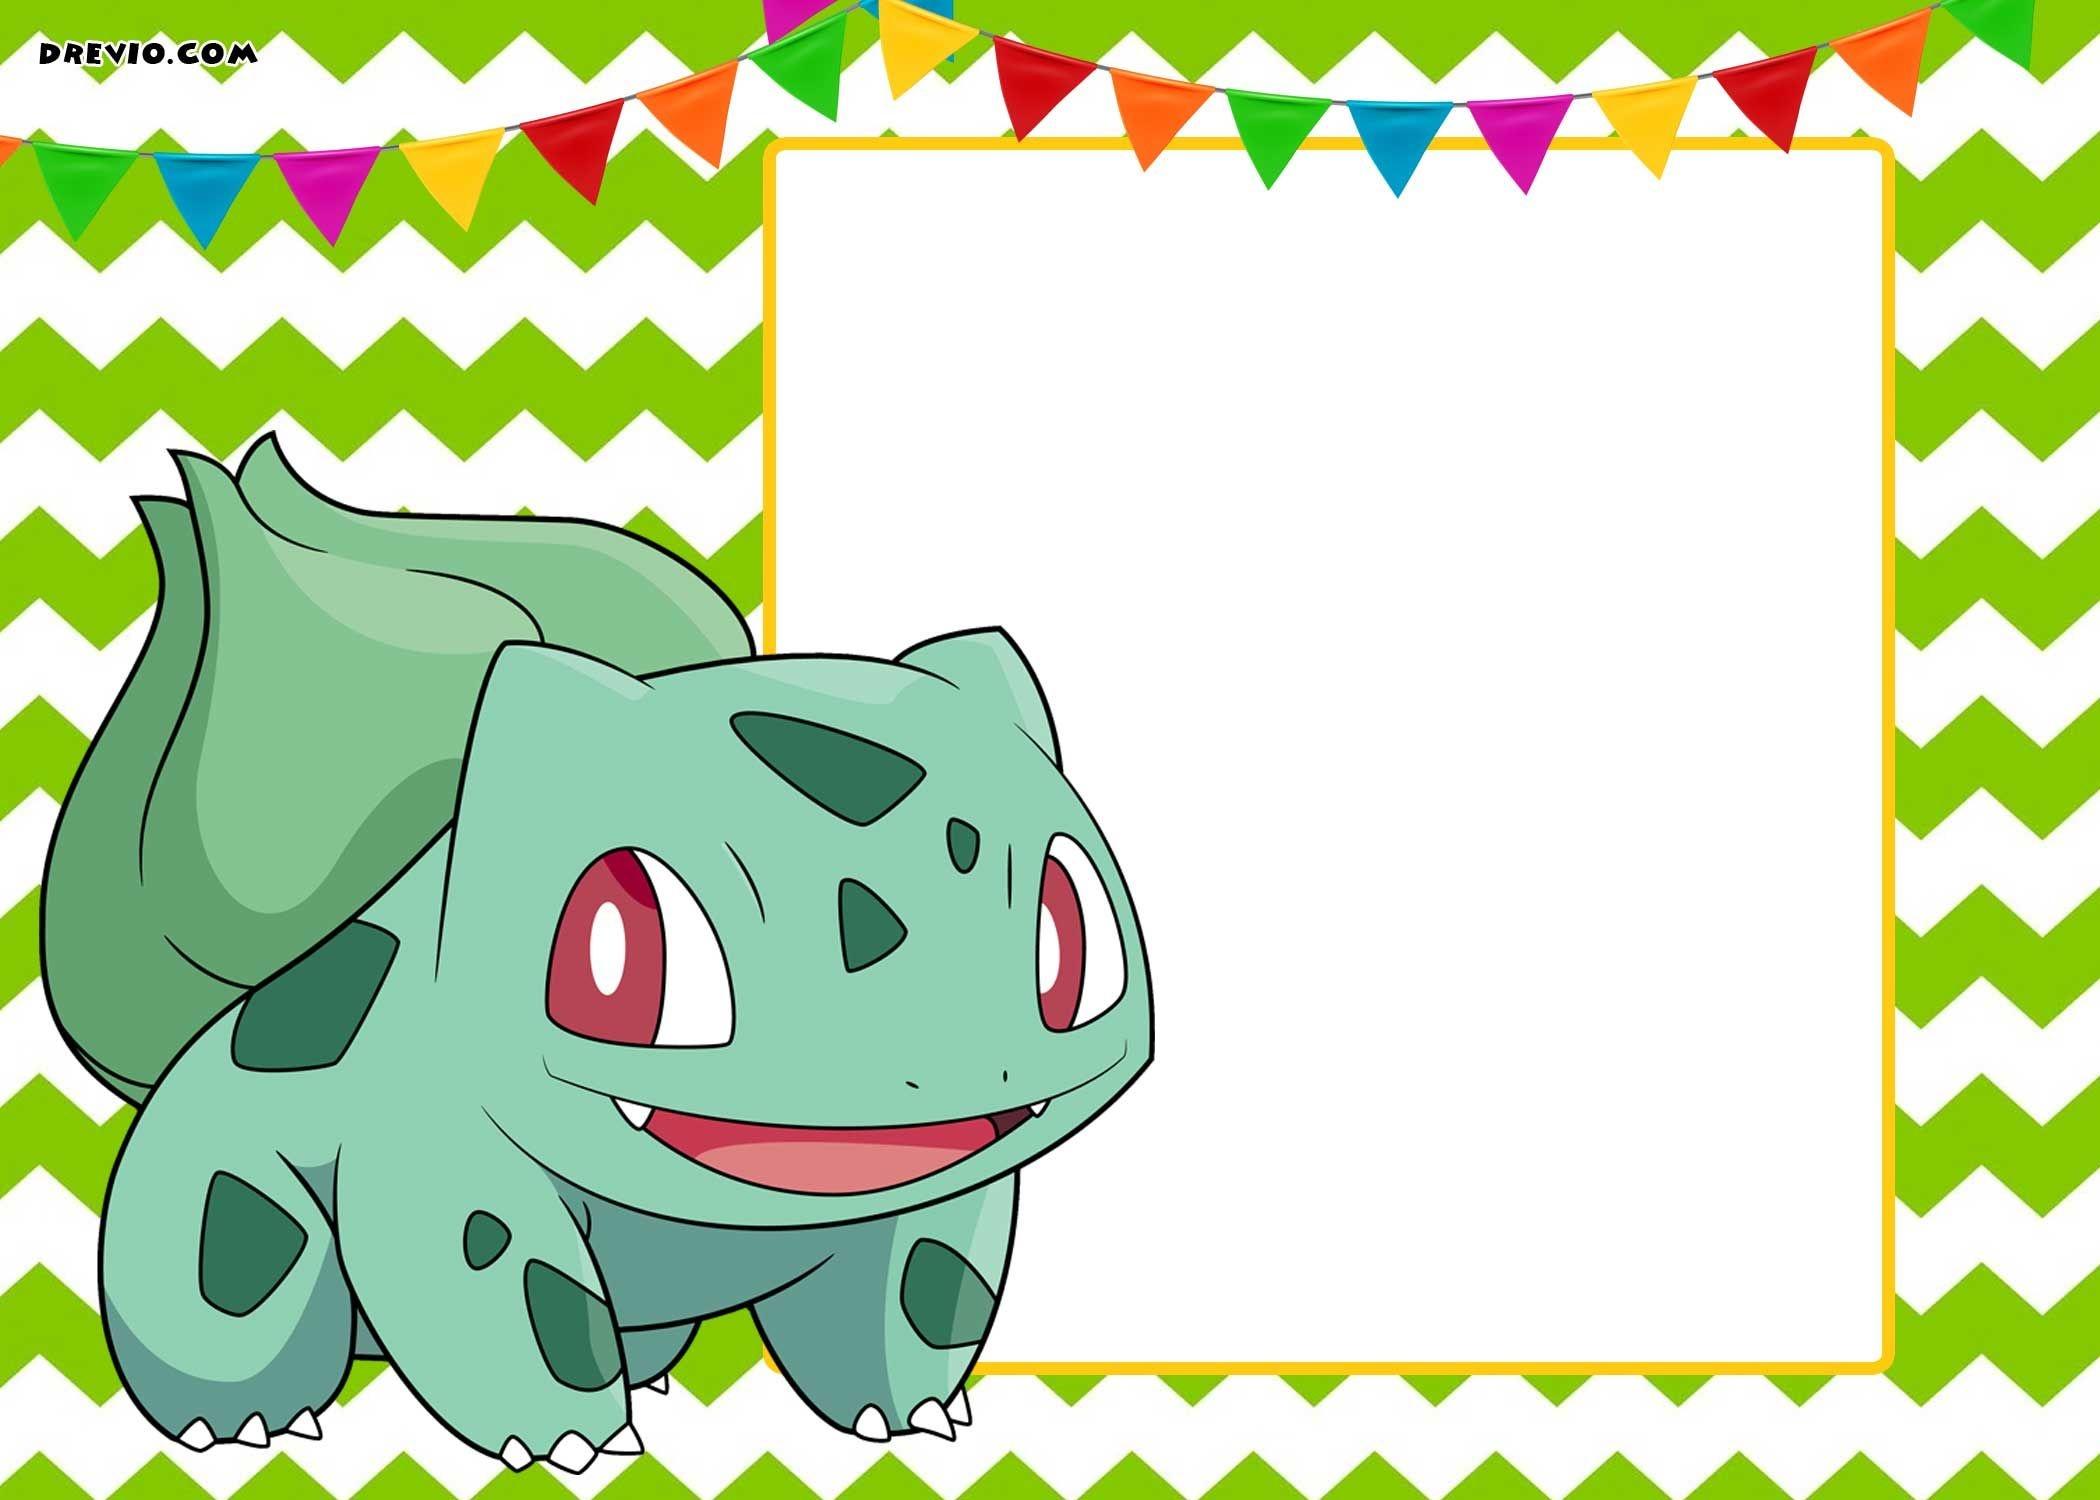 Free Printable Pokemon Invitation Templates | Free Printable - Pokemon Invitations Printable Free